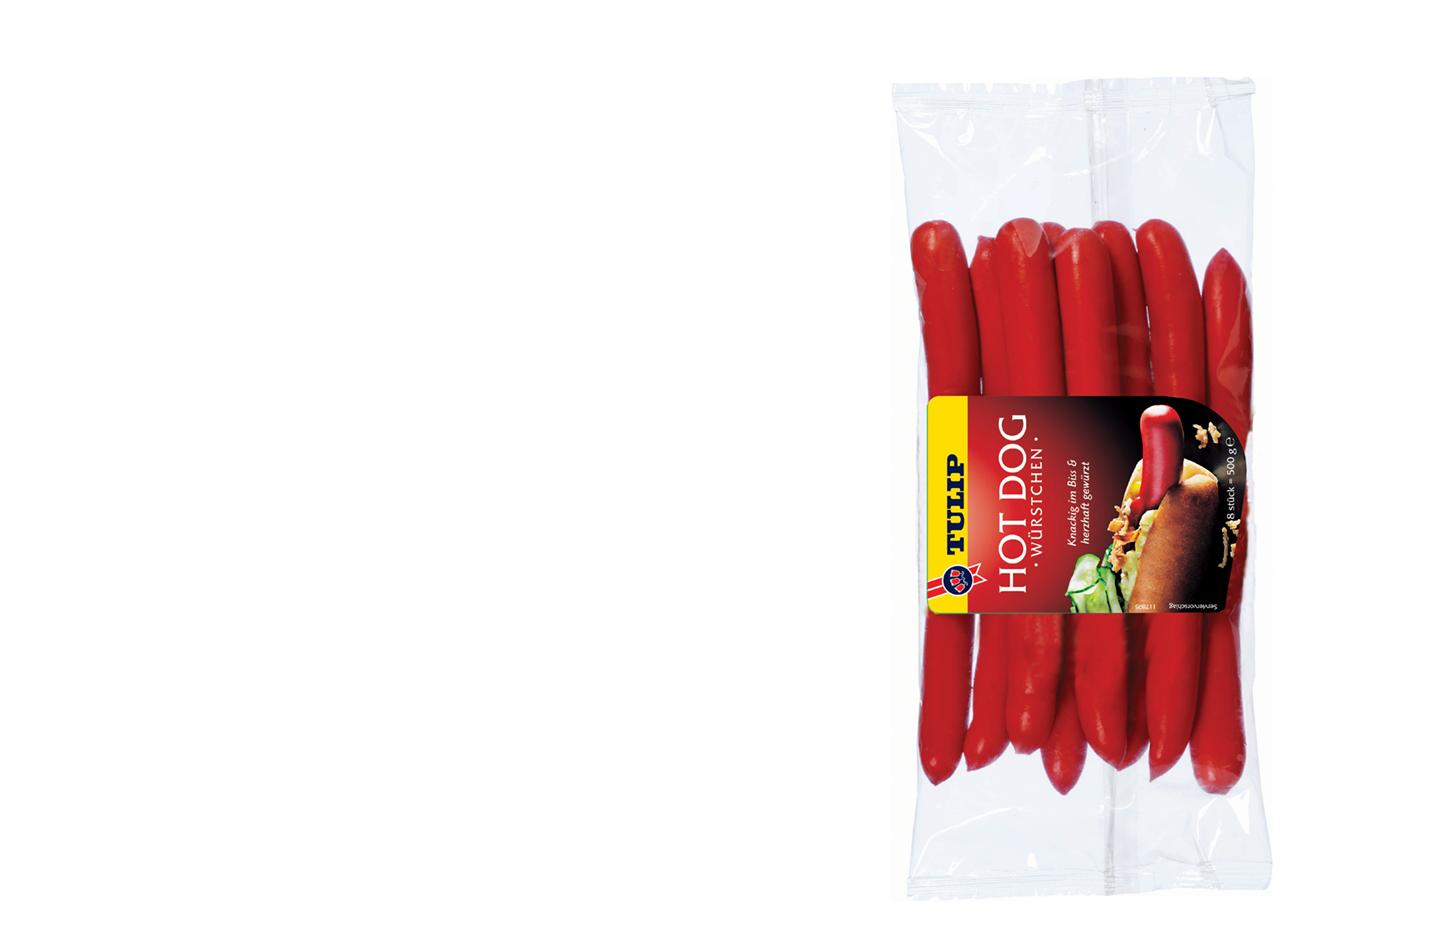 d nisch essen lebensmittel hot dog w rstchen rot. Black Bedroom Furniture Sets. Home Design Ideas